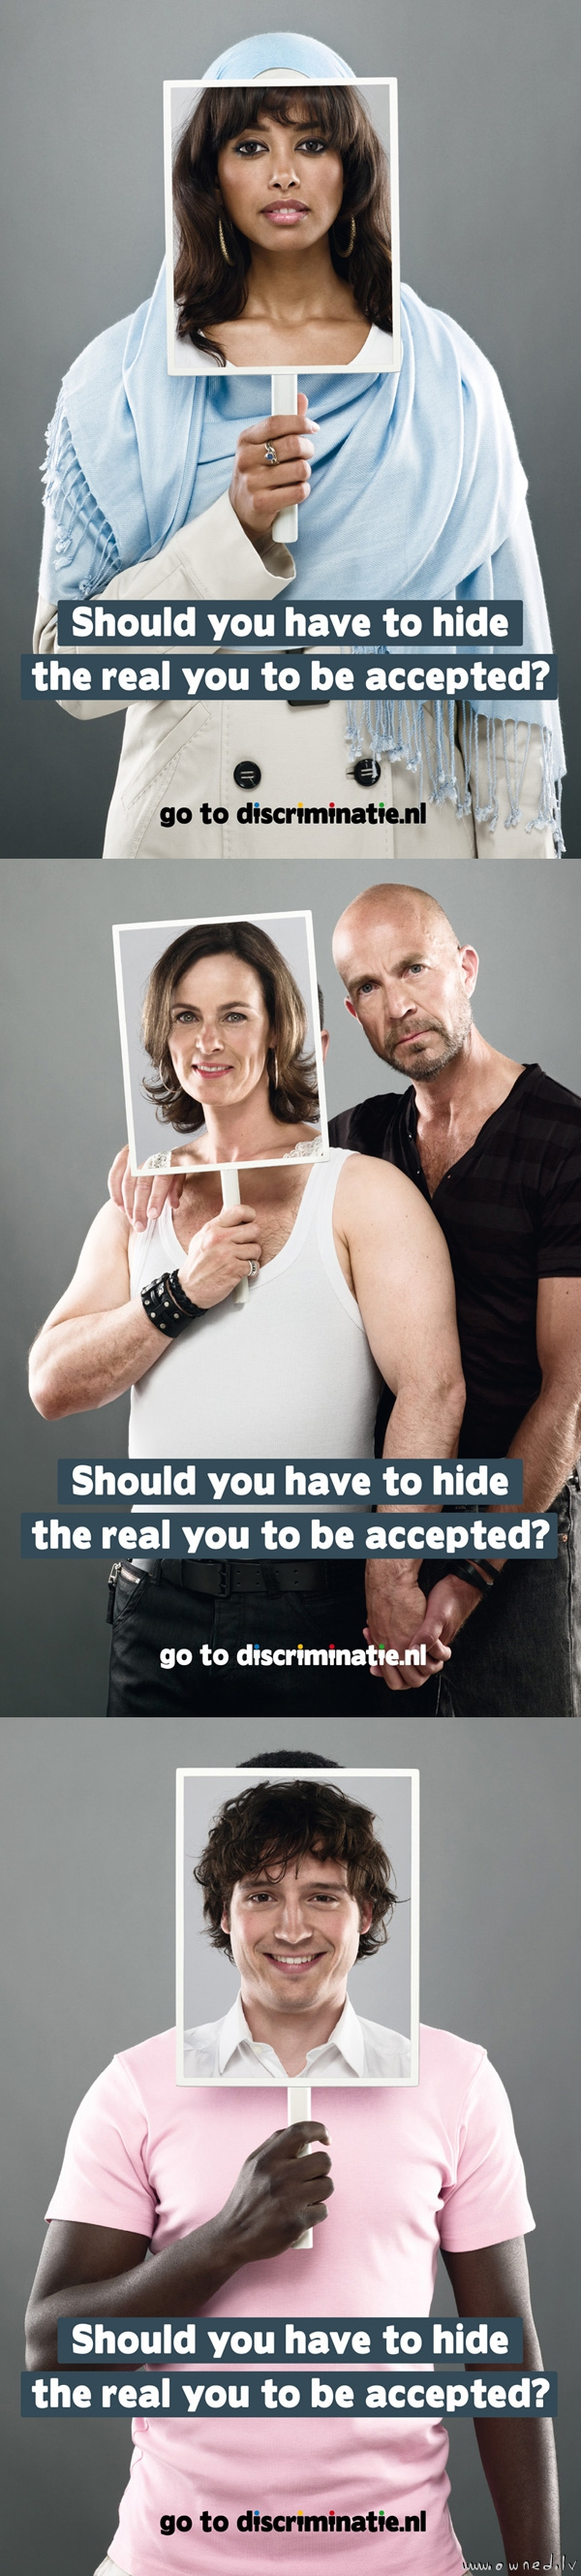 Anti discrimination ad